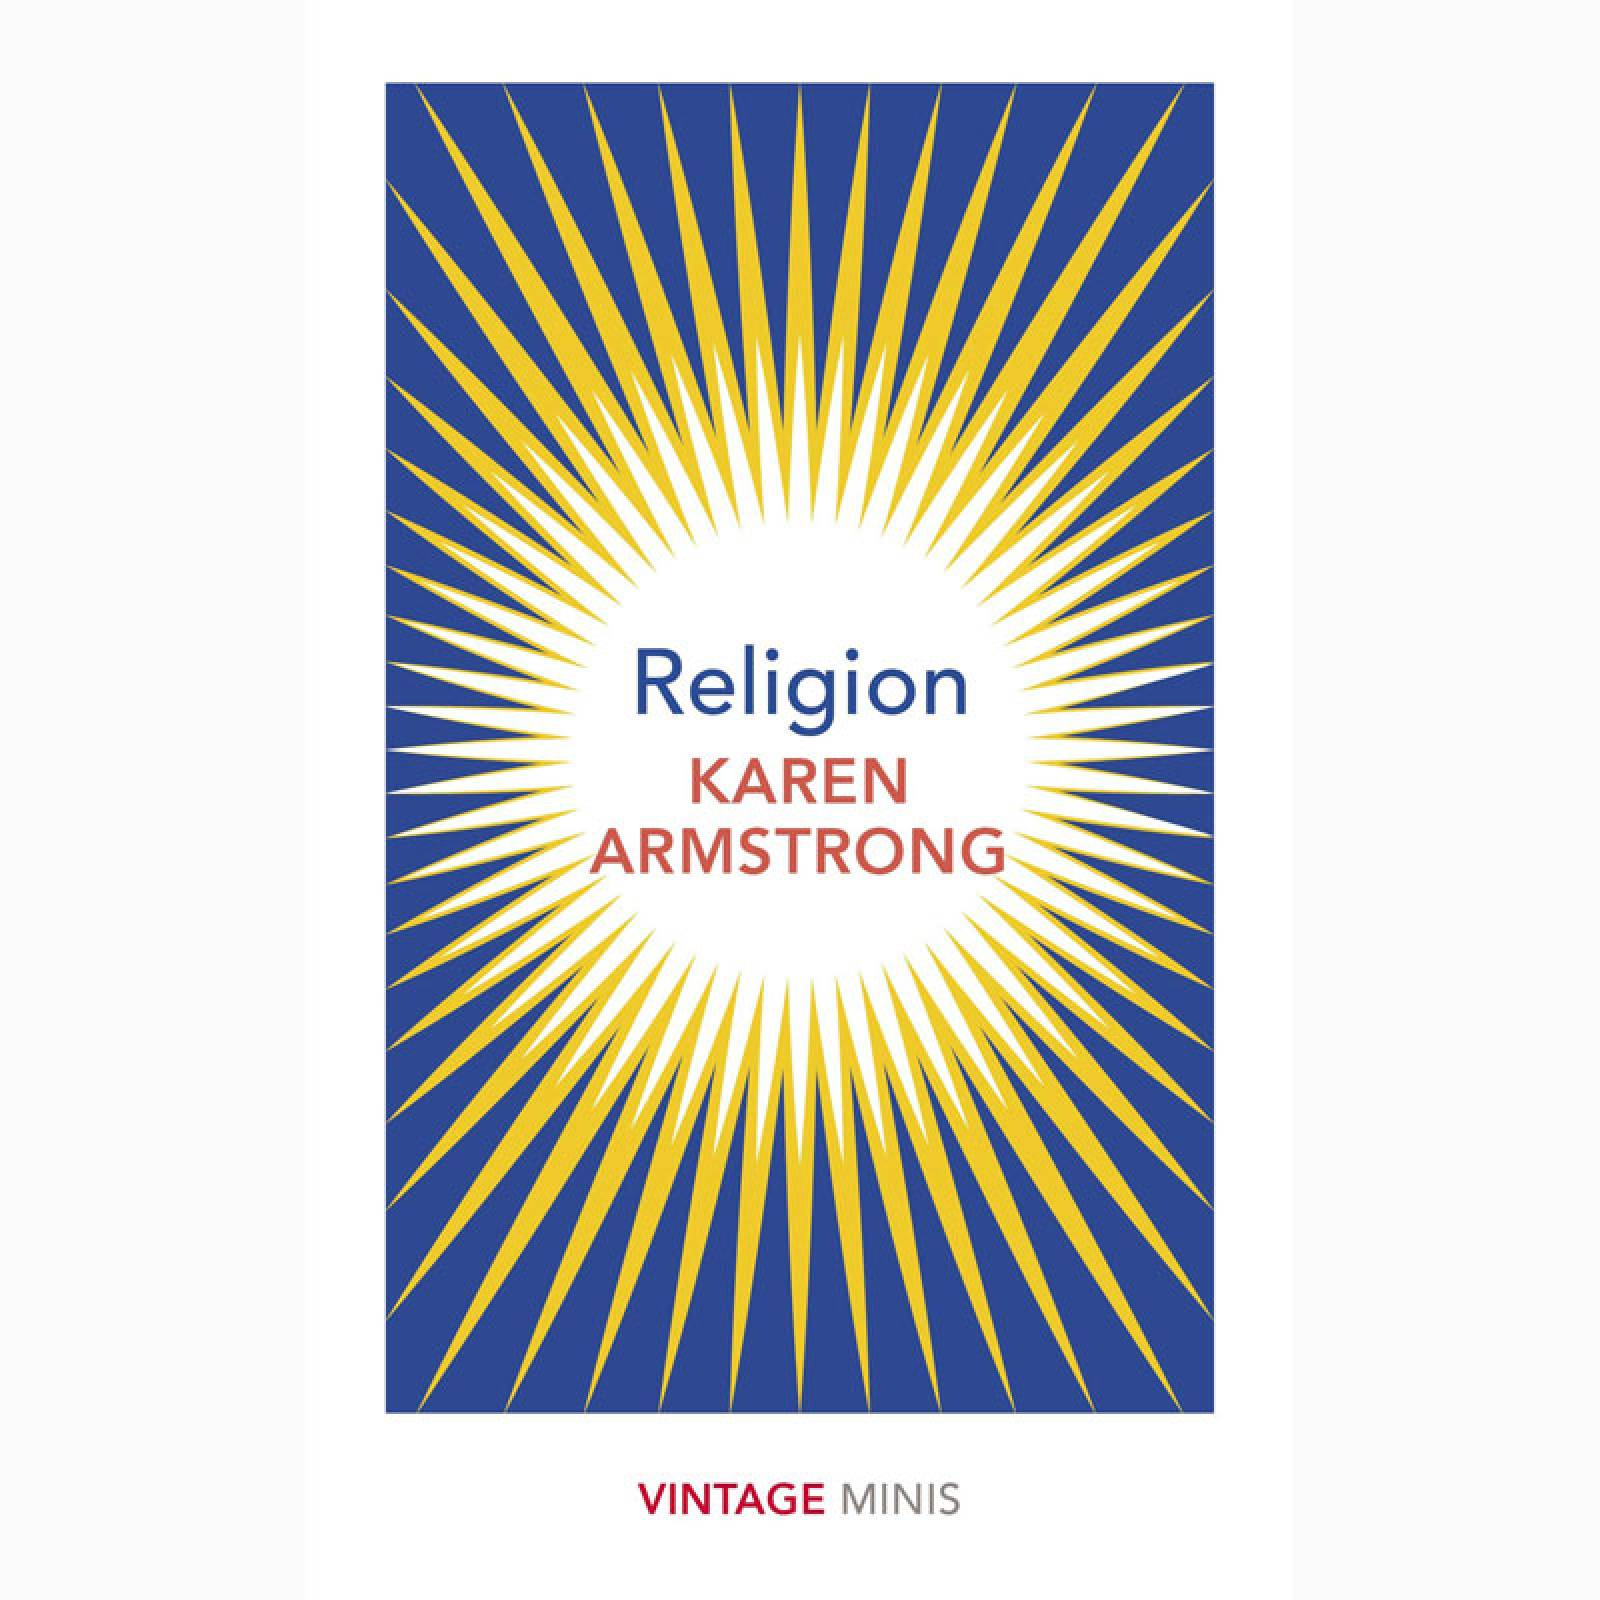 Religion: Vintage Minis - Paperback Book